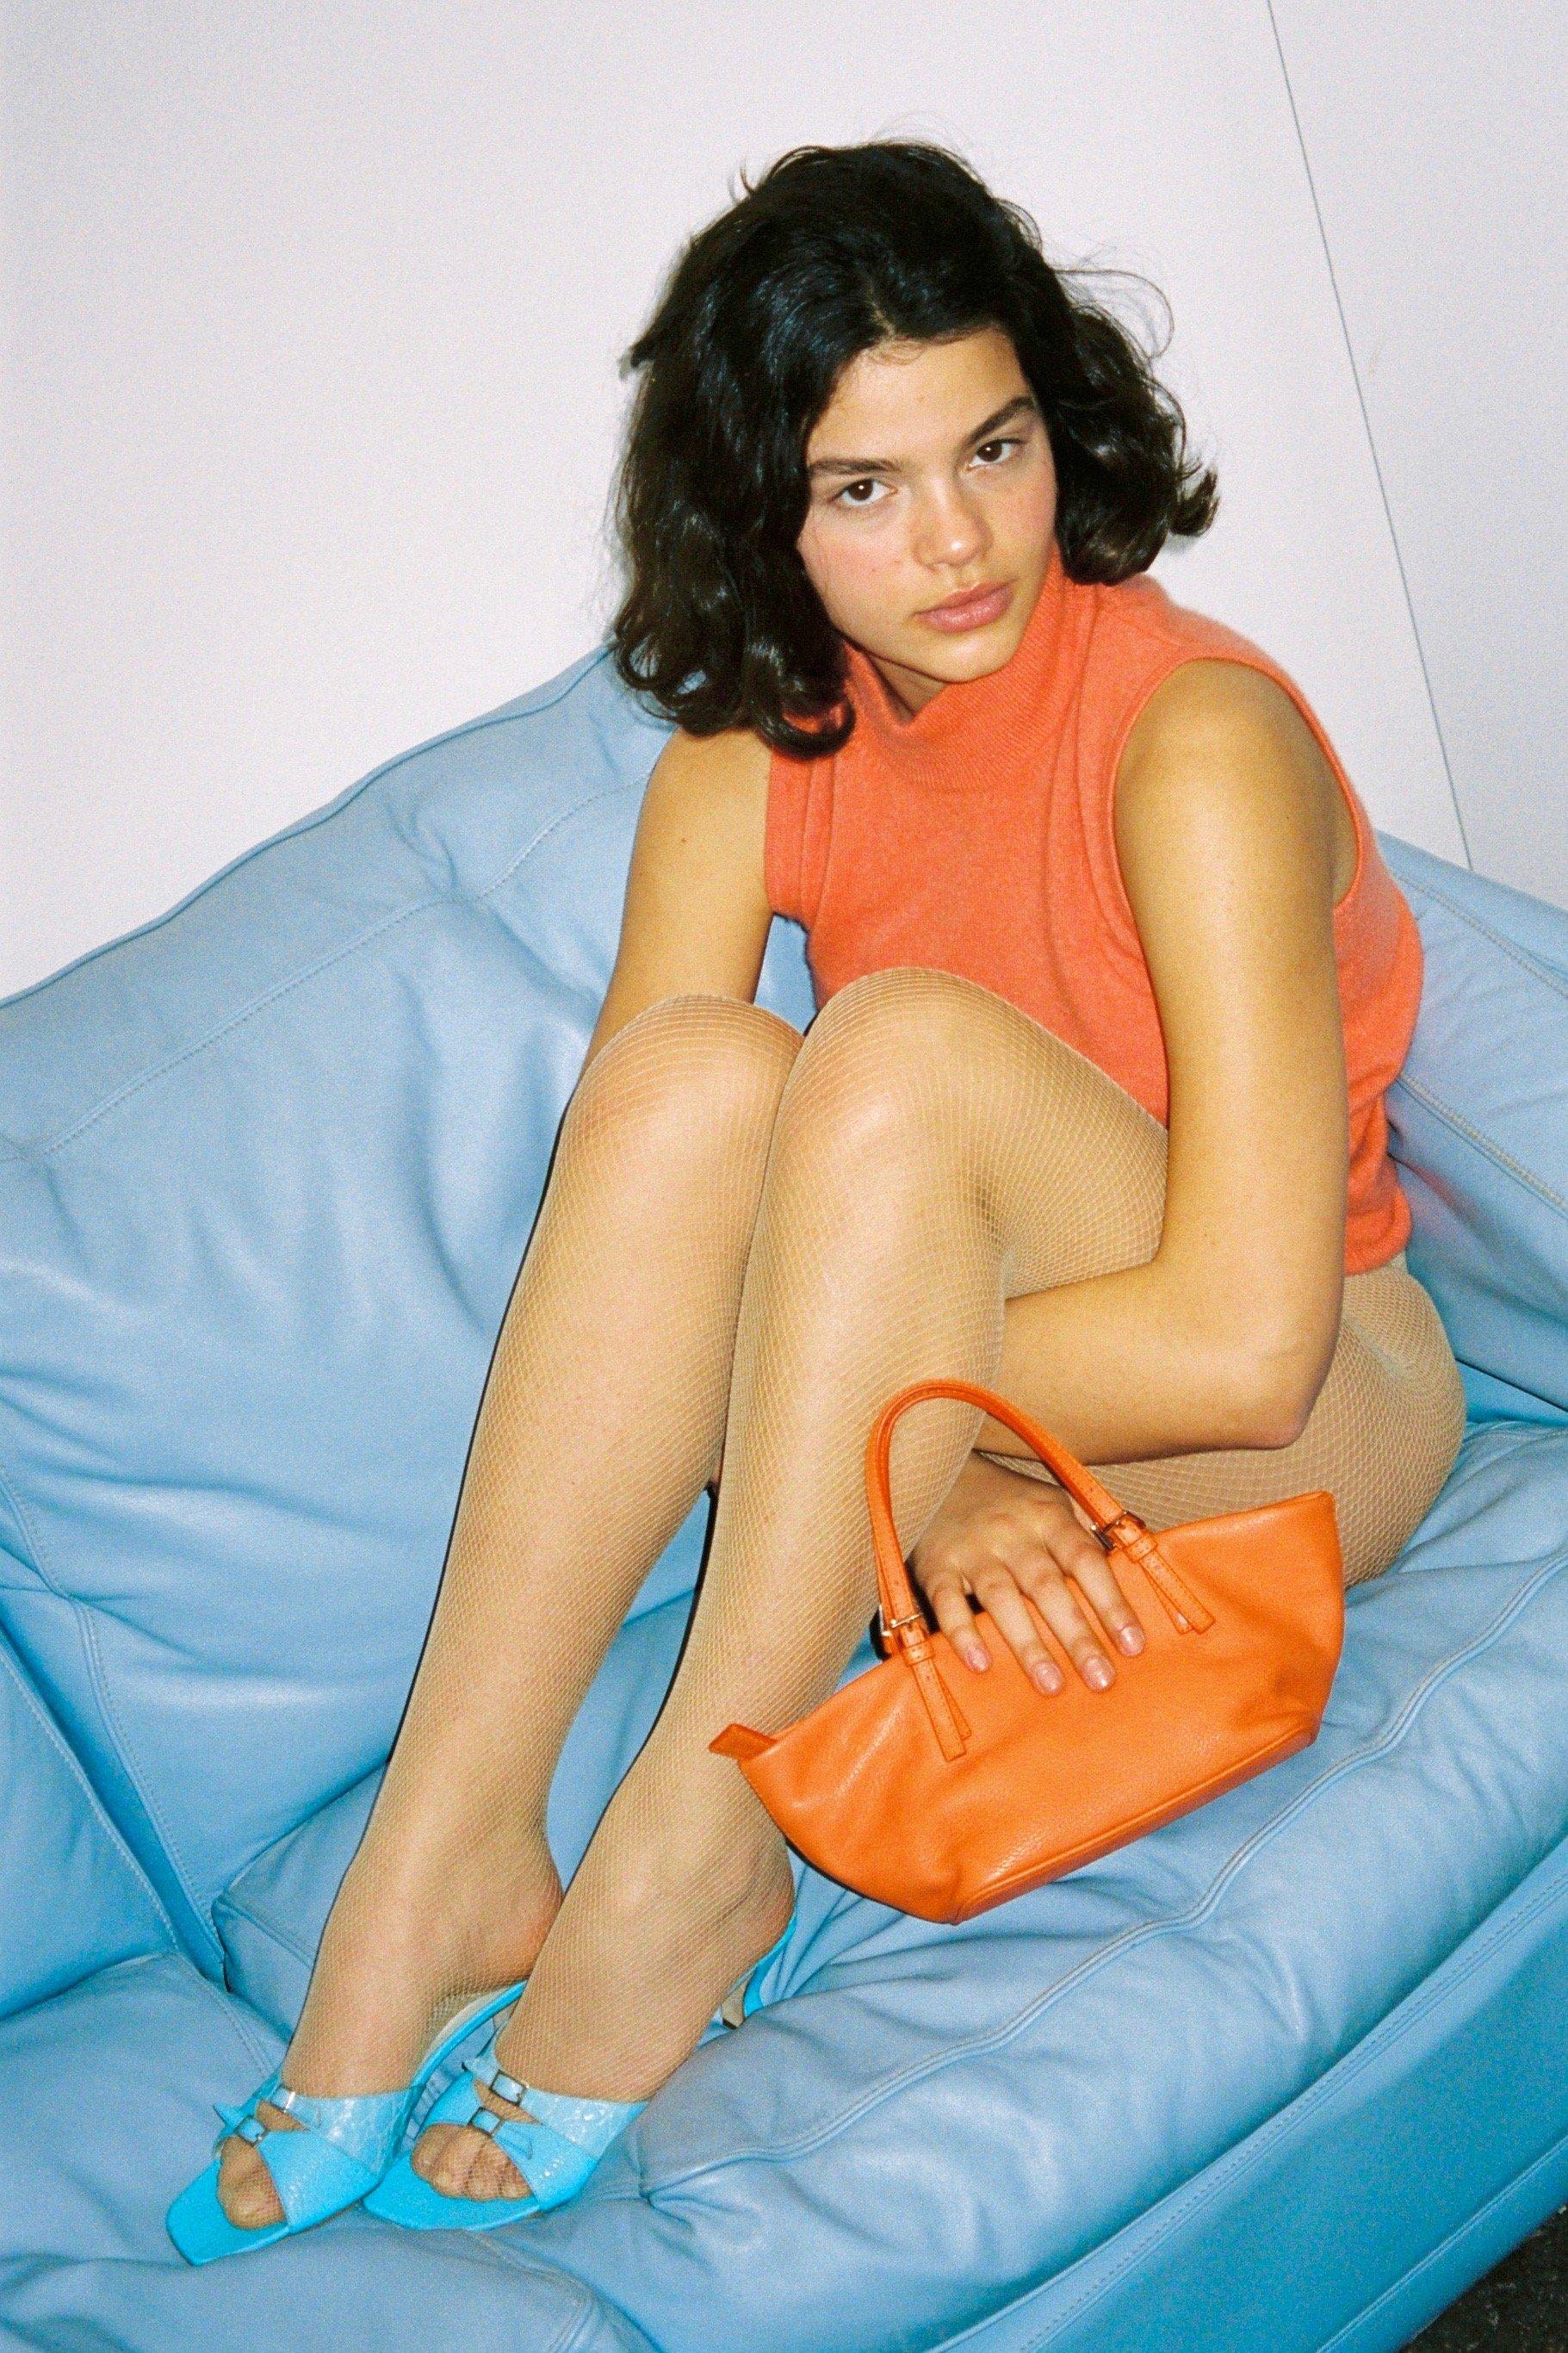 Girl in orange sitting on a blue sofa